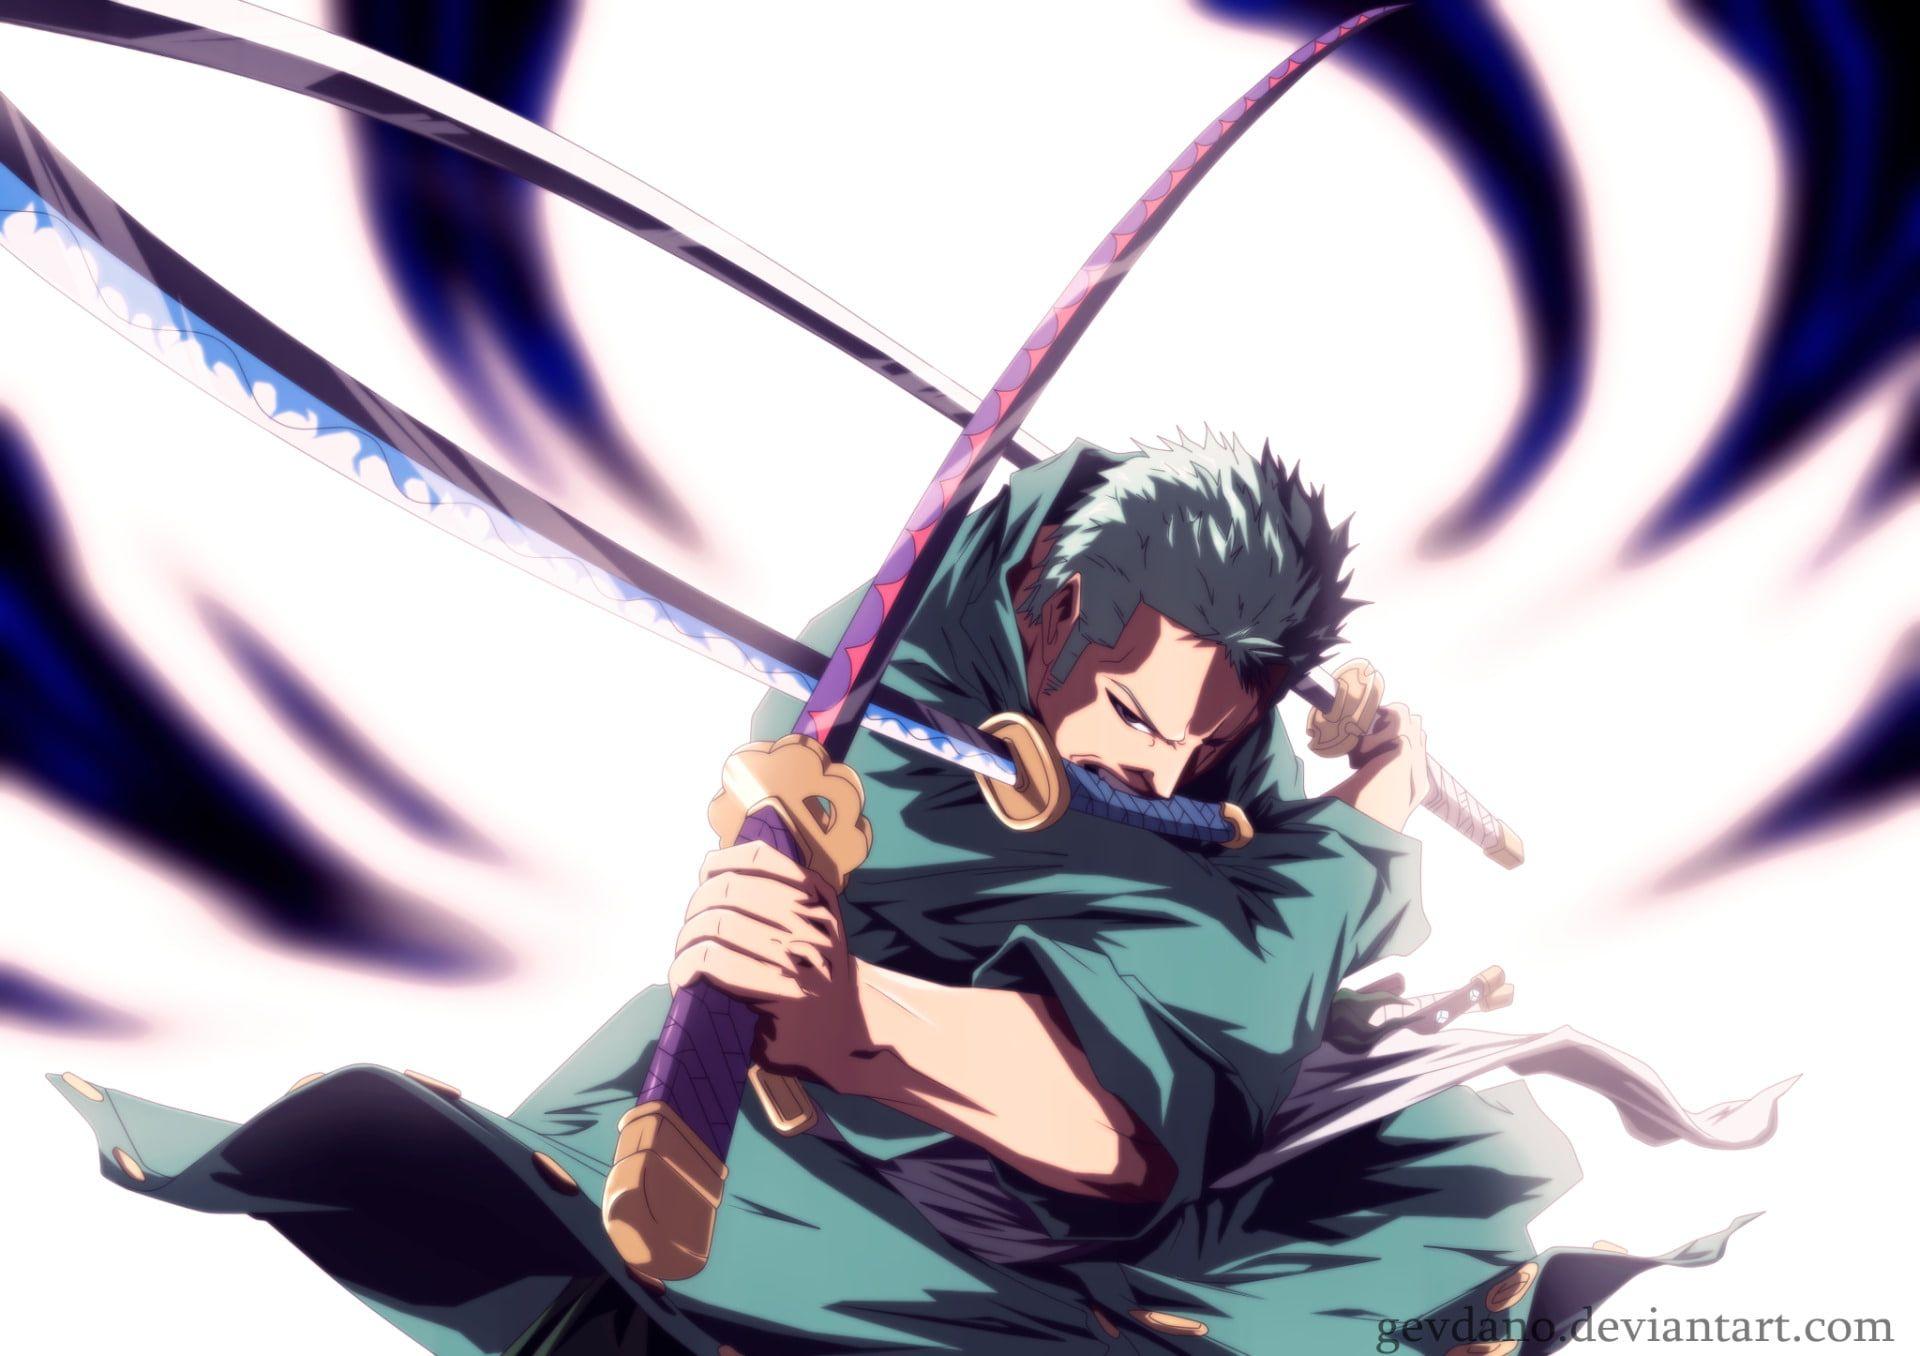 Anime One Piece Zoro Roronoa 1080p Wallpaper Hdwallpaper Desktop Anime Cowboy Bebop Anime Anime One